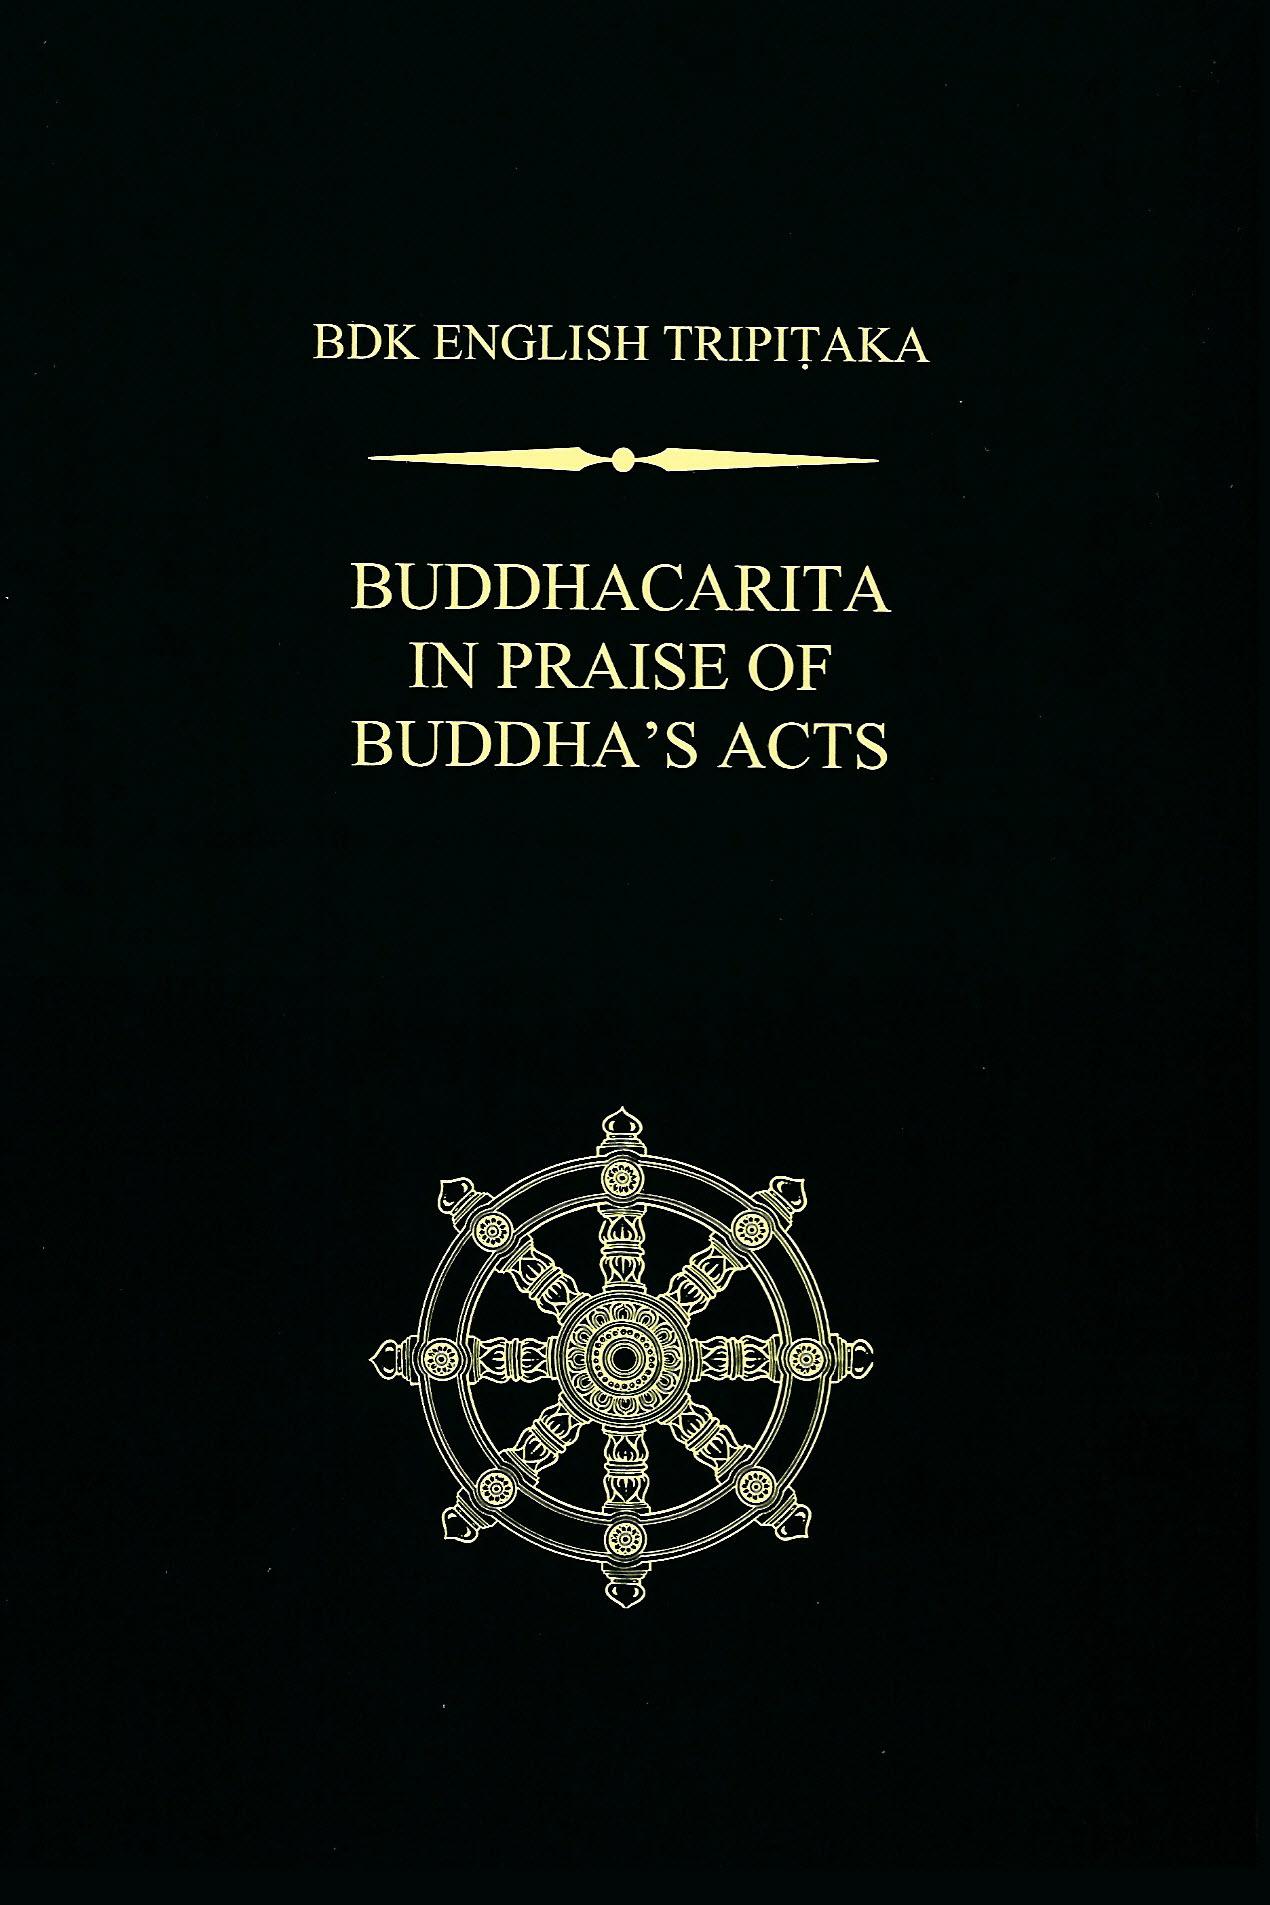 Willemen Buddhacarita cover art